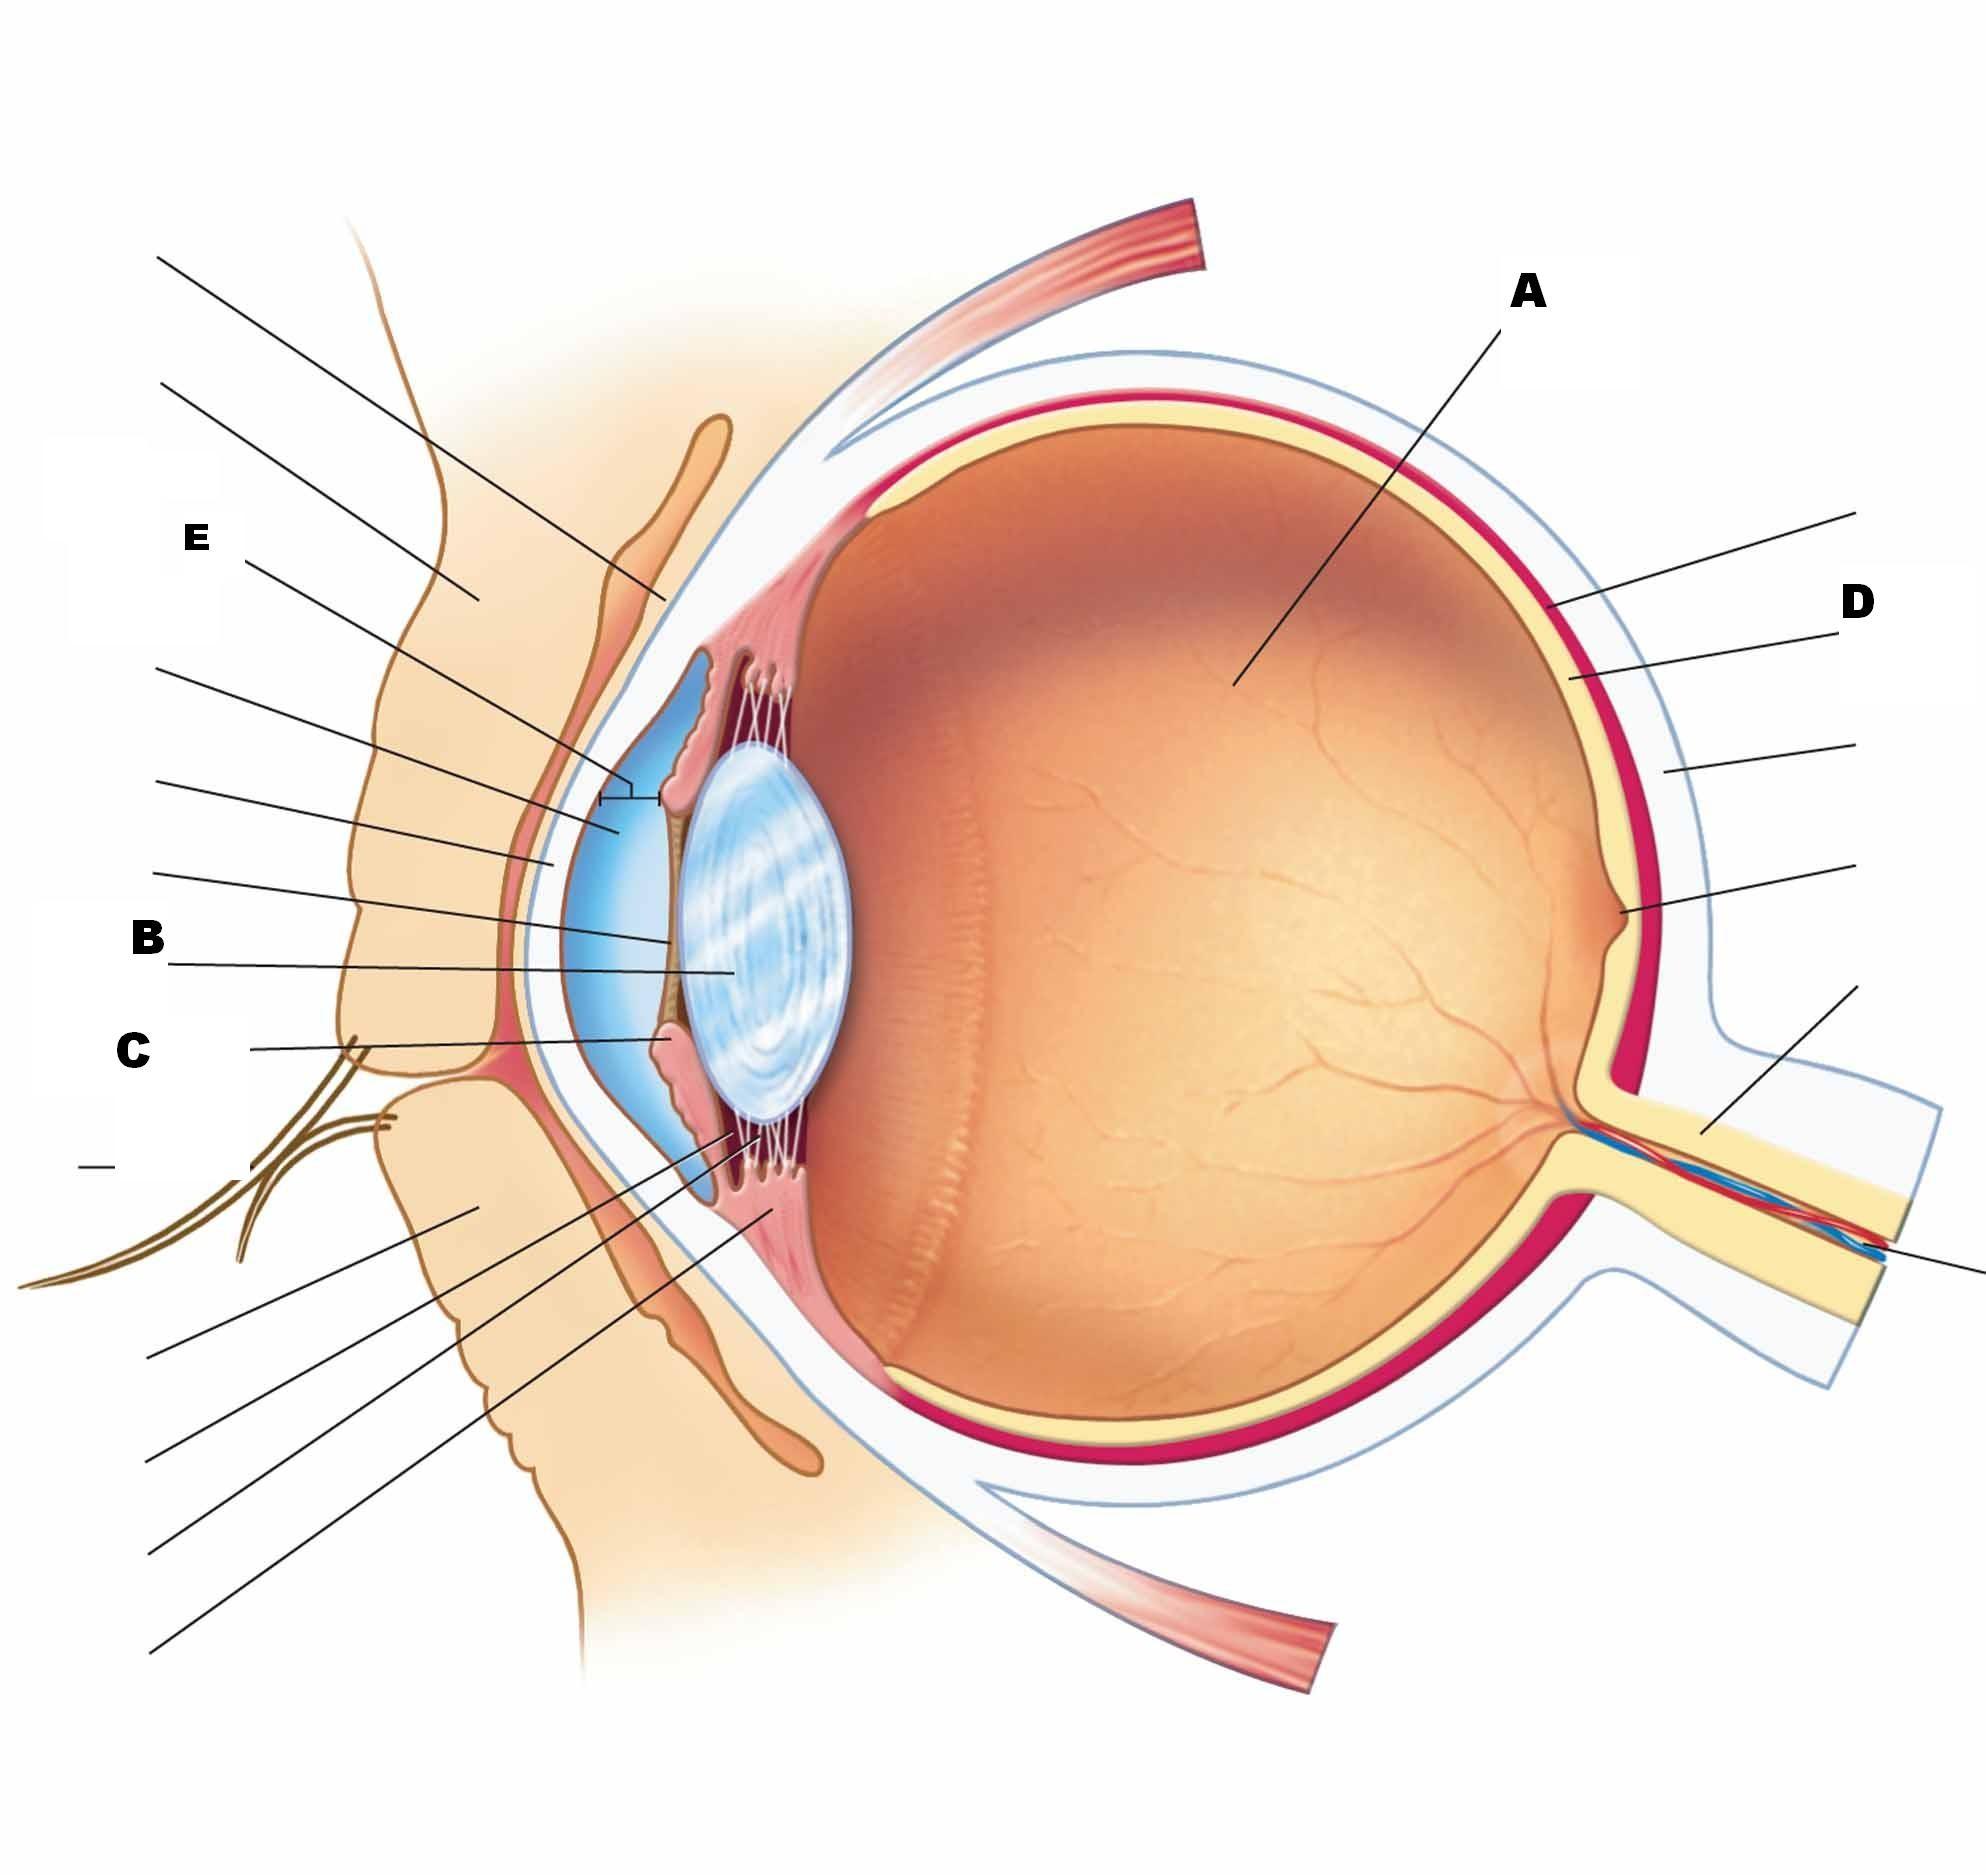 eye labeling diagram quiz idealarc welder anatomy and physiology ii test iii proprofs